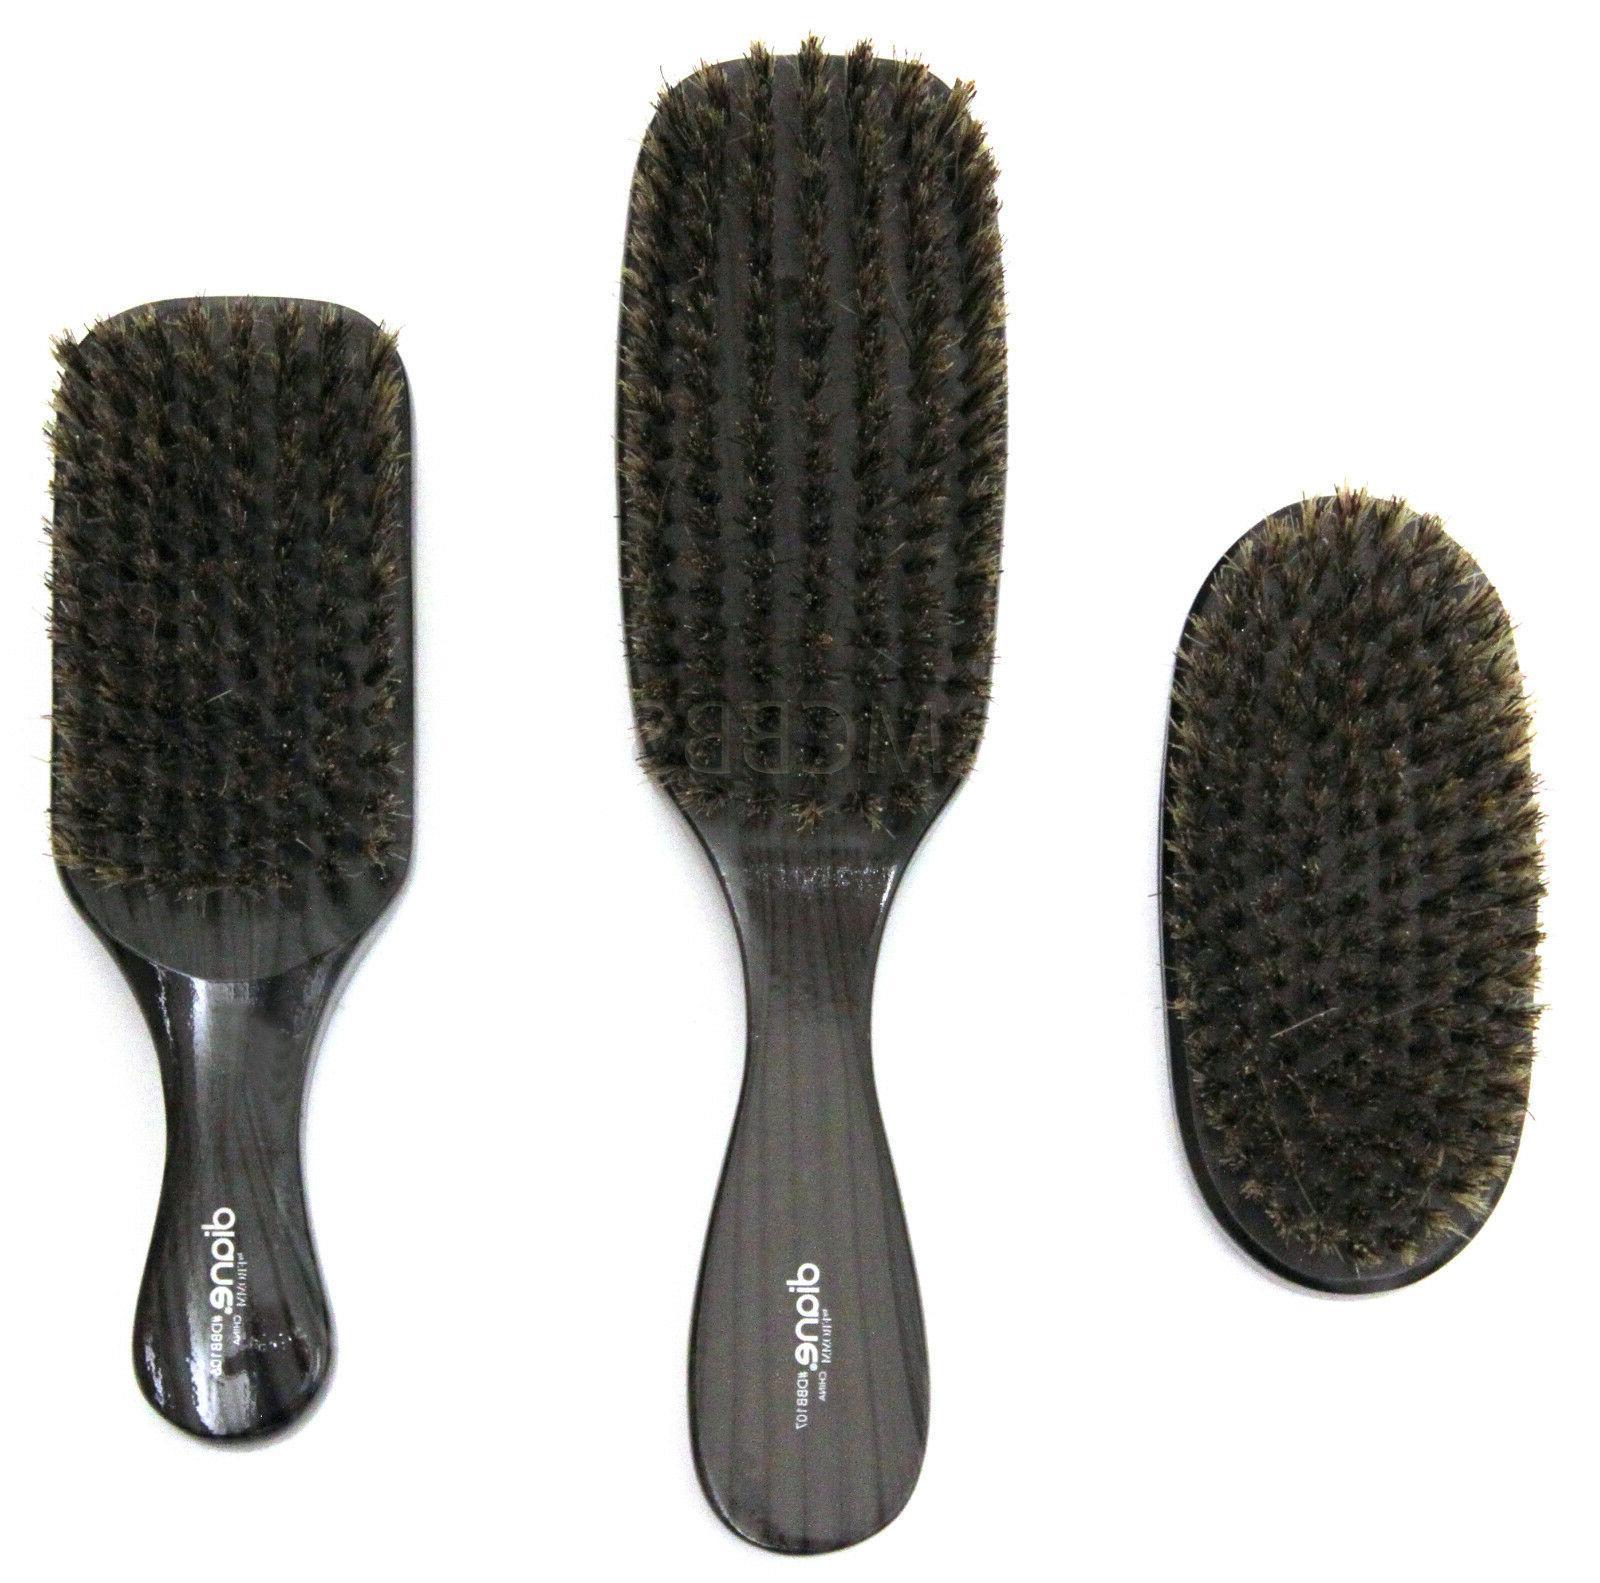 the original 100 percent boar bristle hair